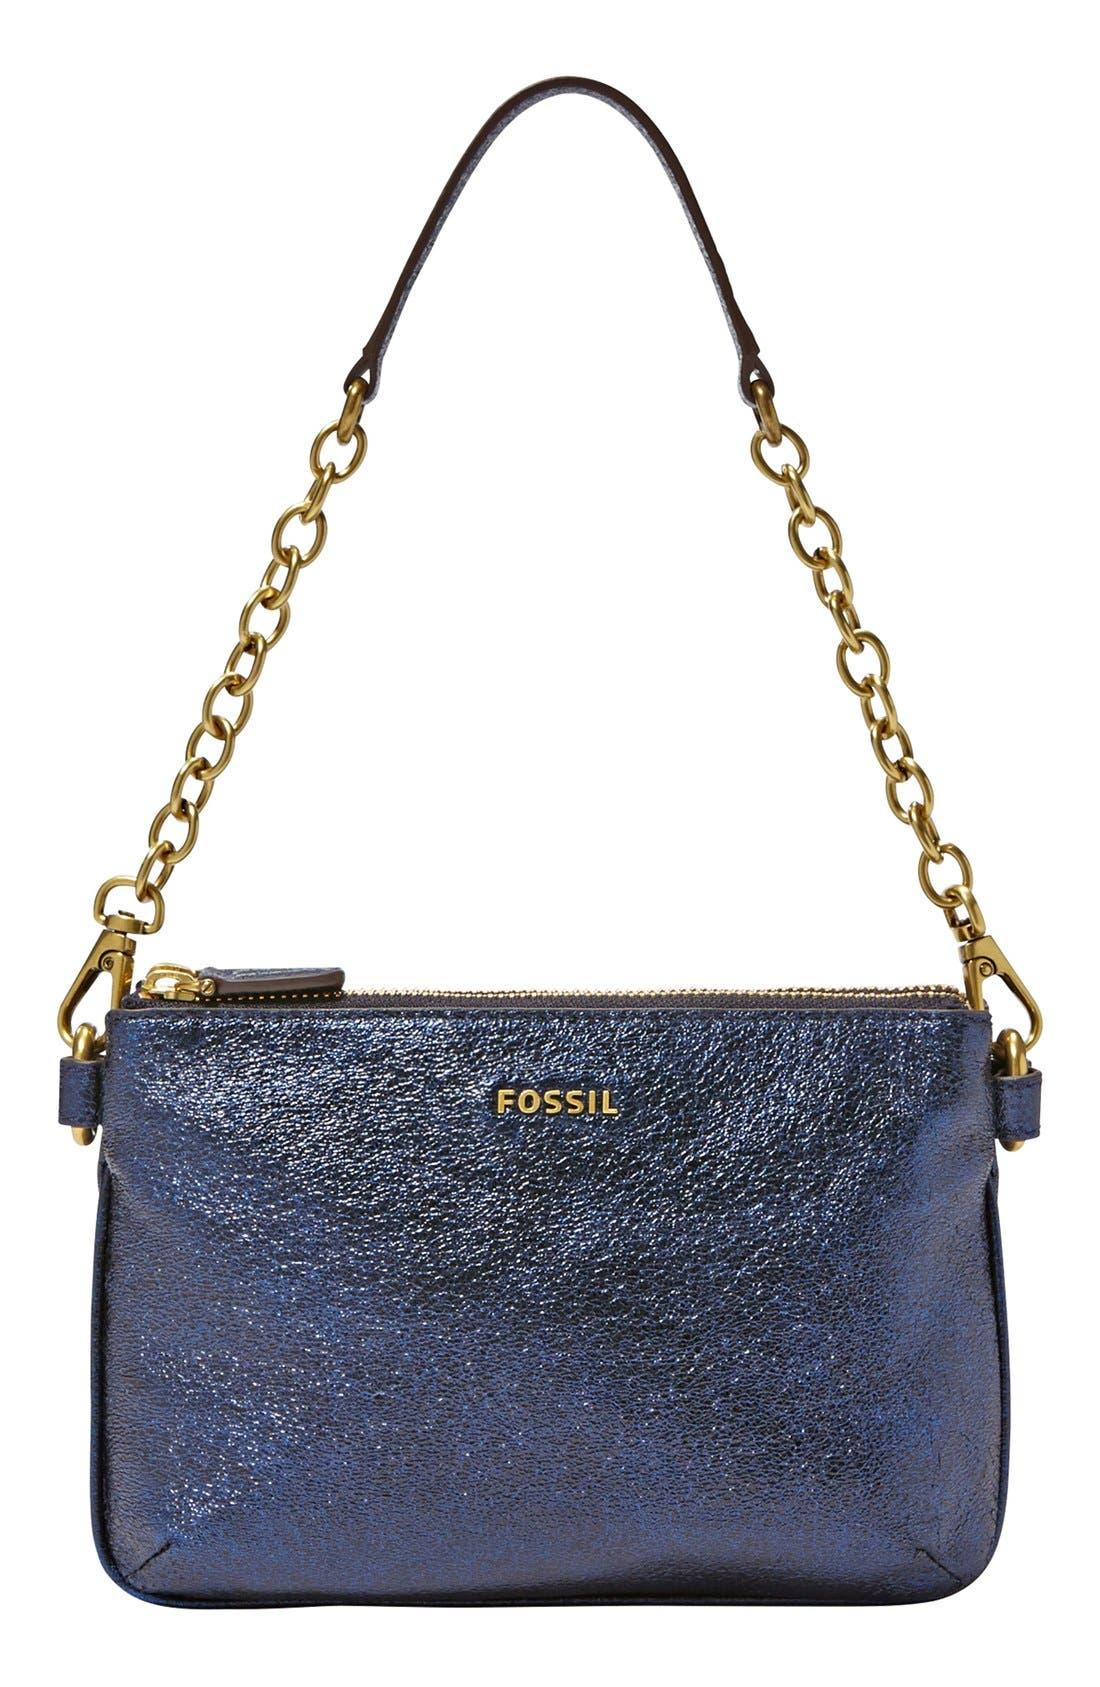 Main Image - Fossil 'Memoir' Leather Shoulder Bag